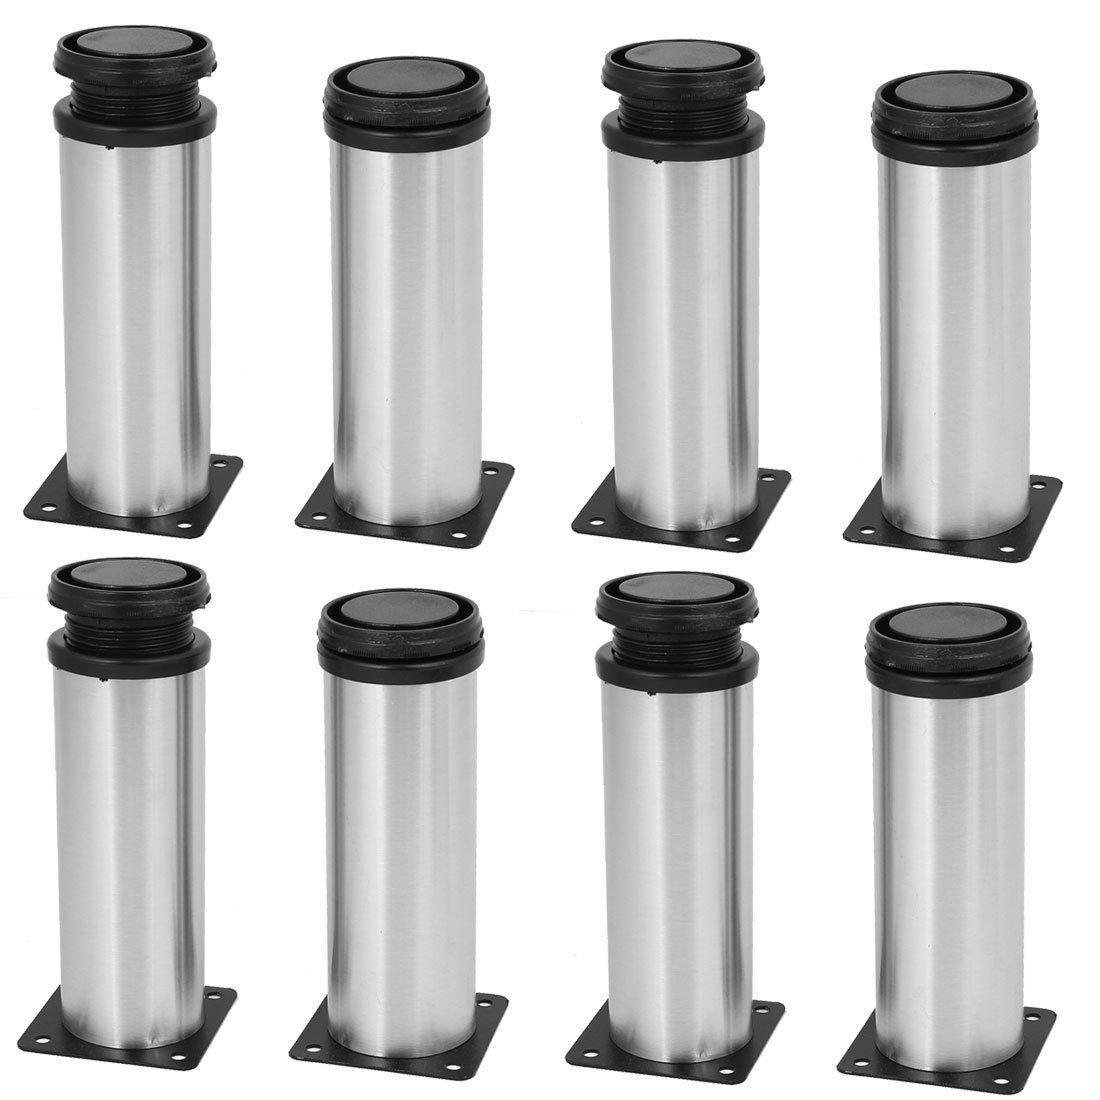 uxcell 50mm x 150mm Metal Adjustable Shelf Cabinet Feet Leg Round Stand 8PCS